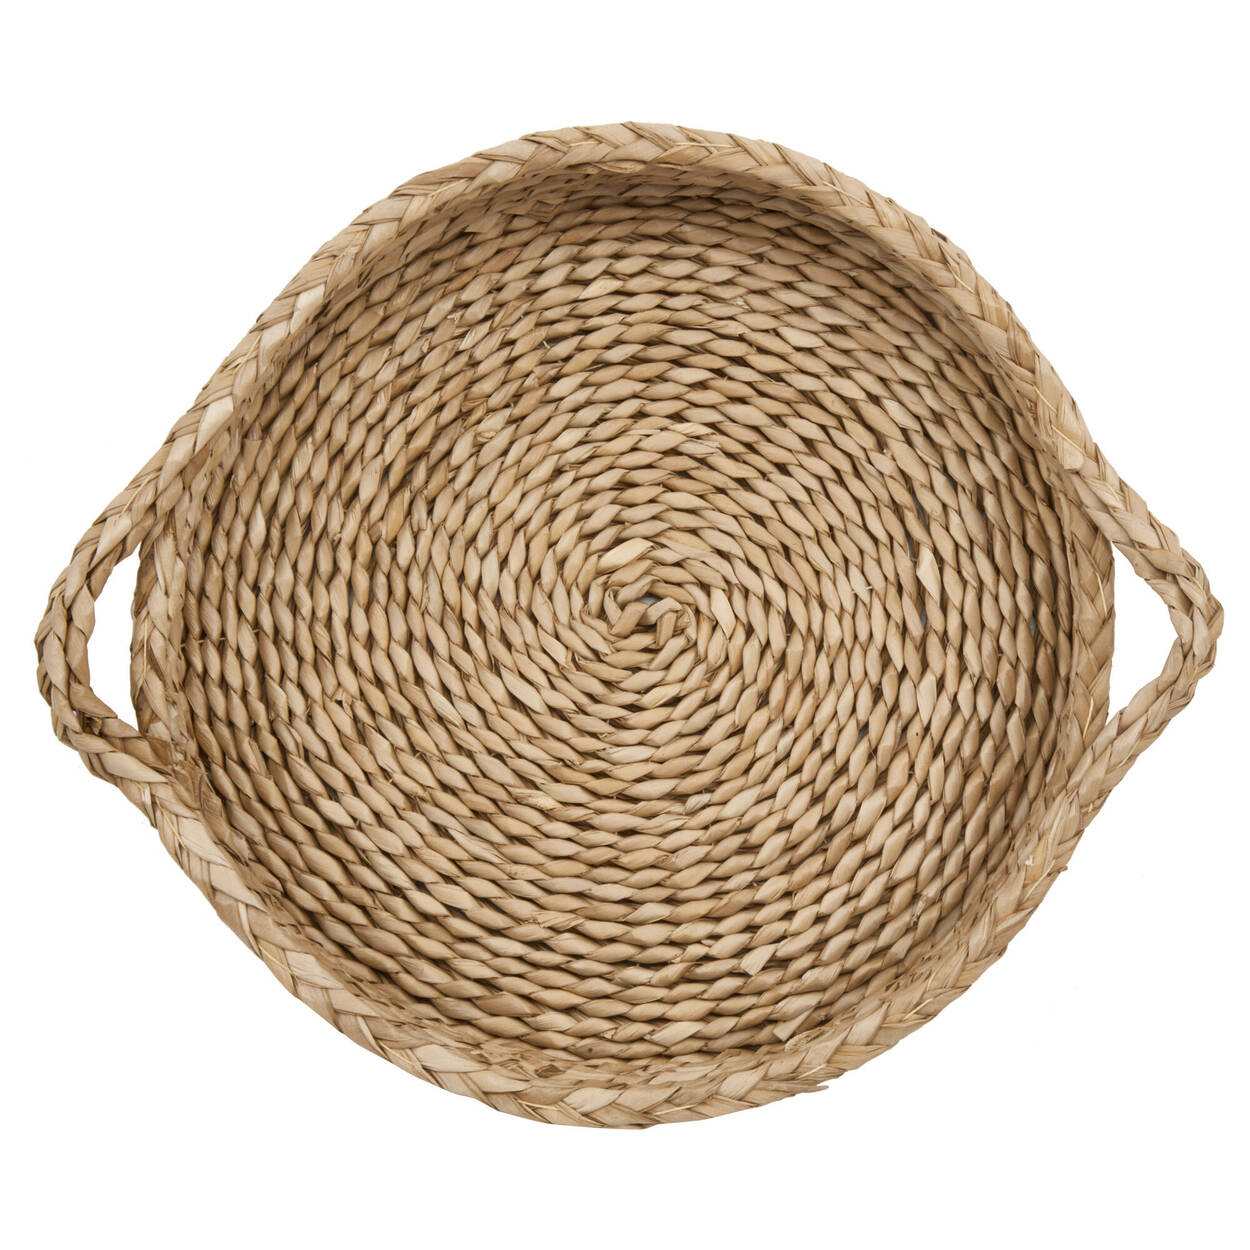 Round Woven Tray